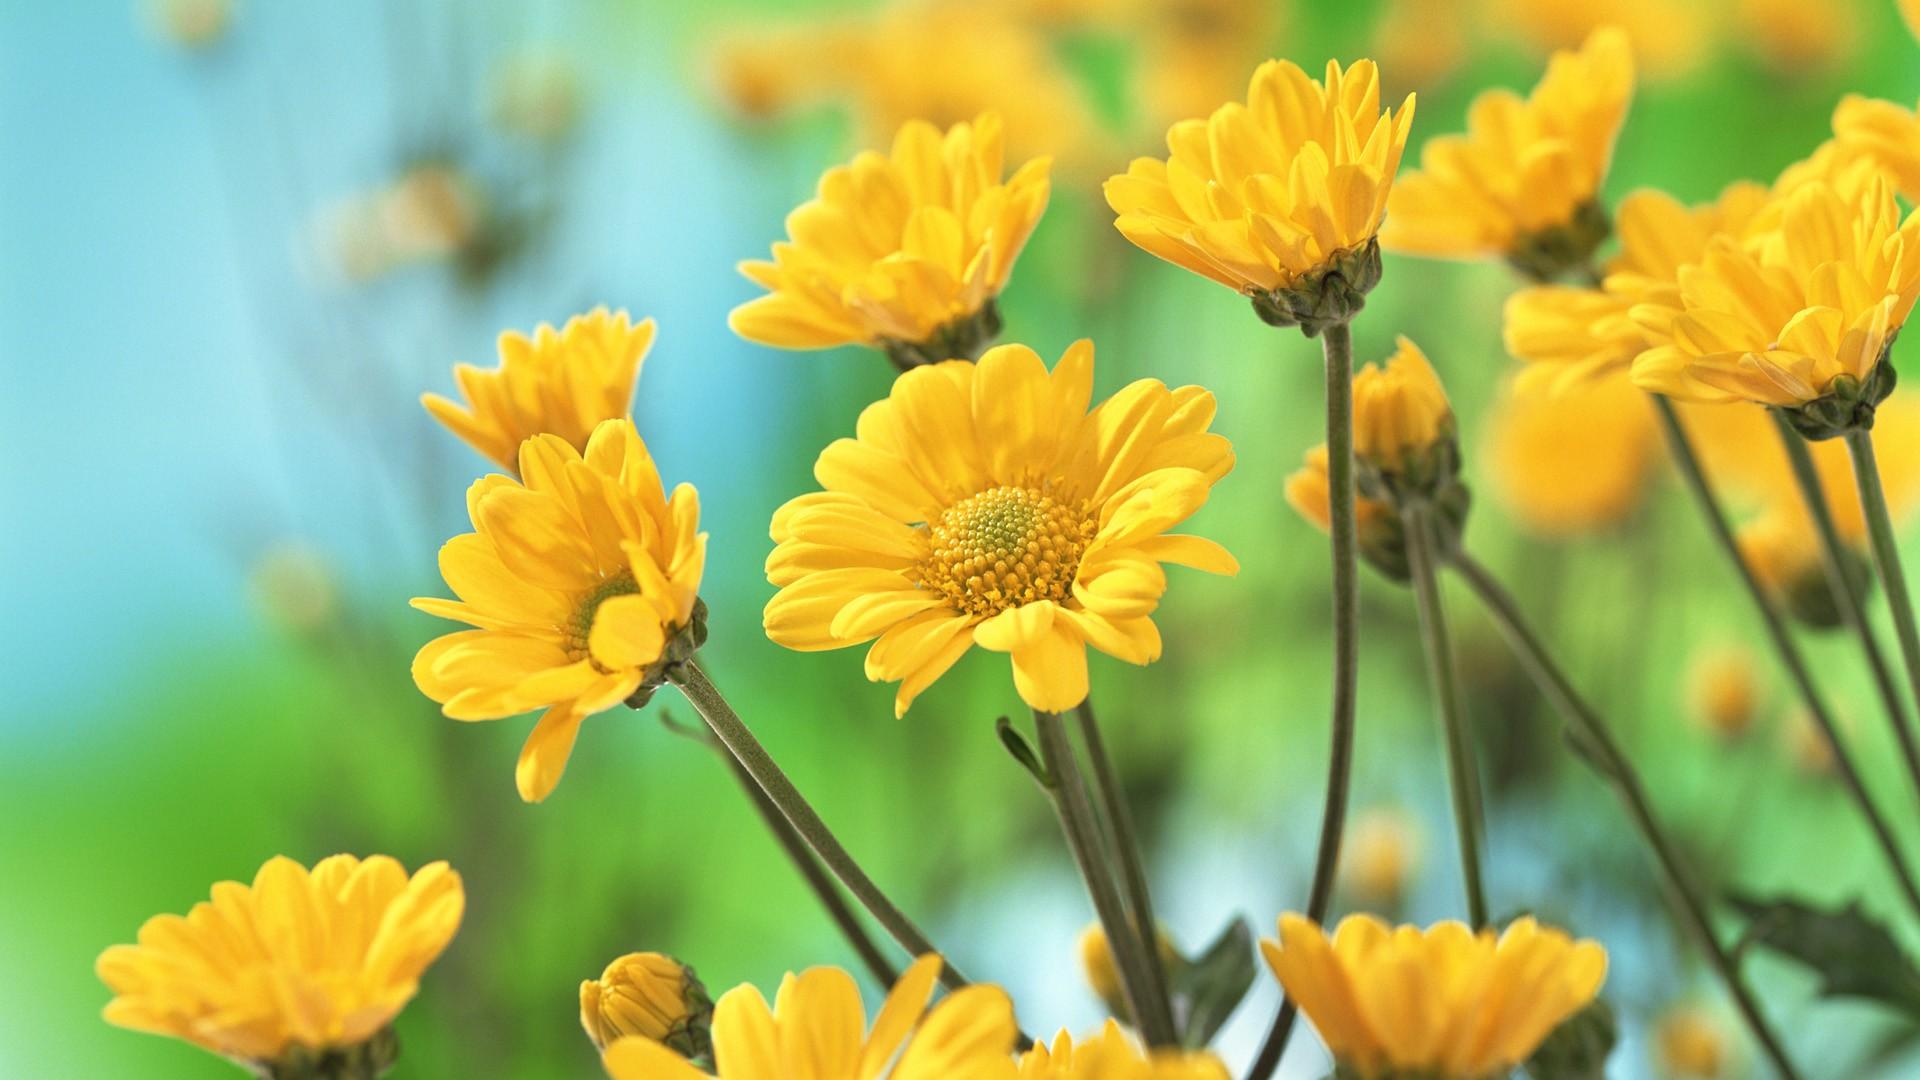 Yellow Flower Wallpaper Free